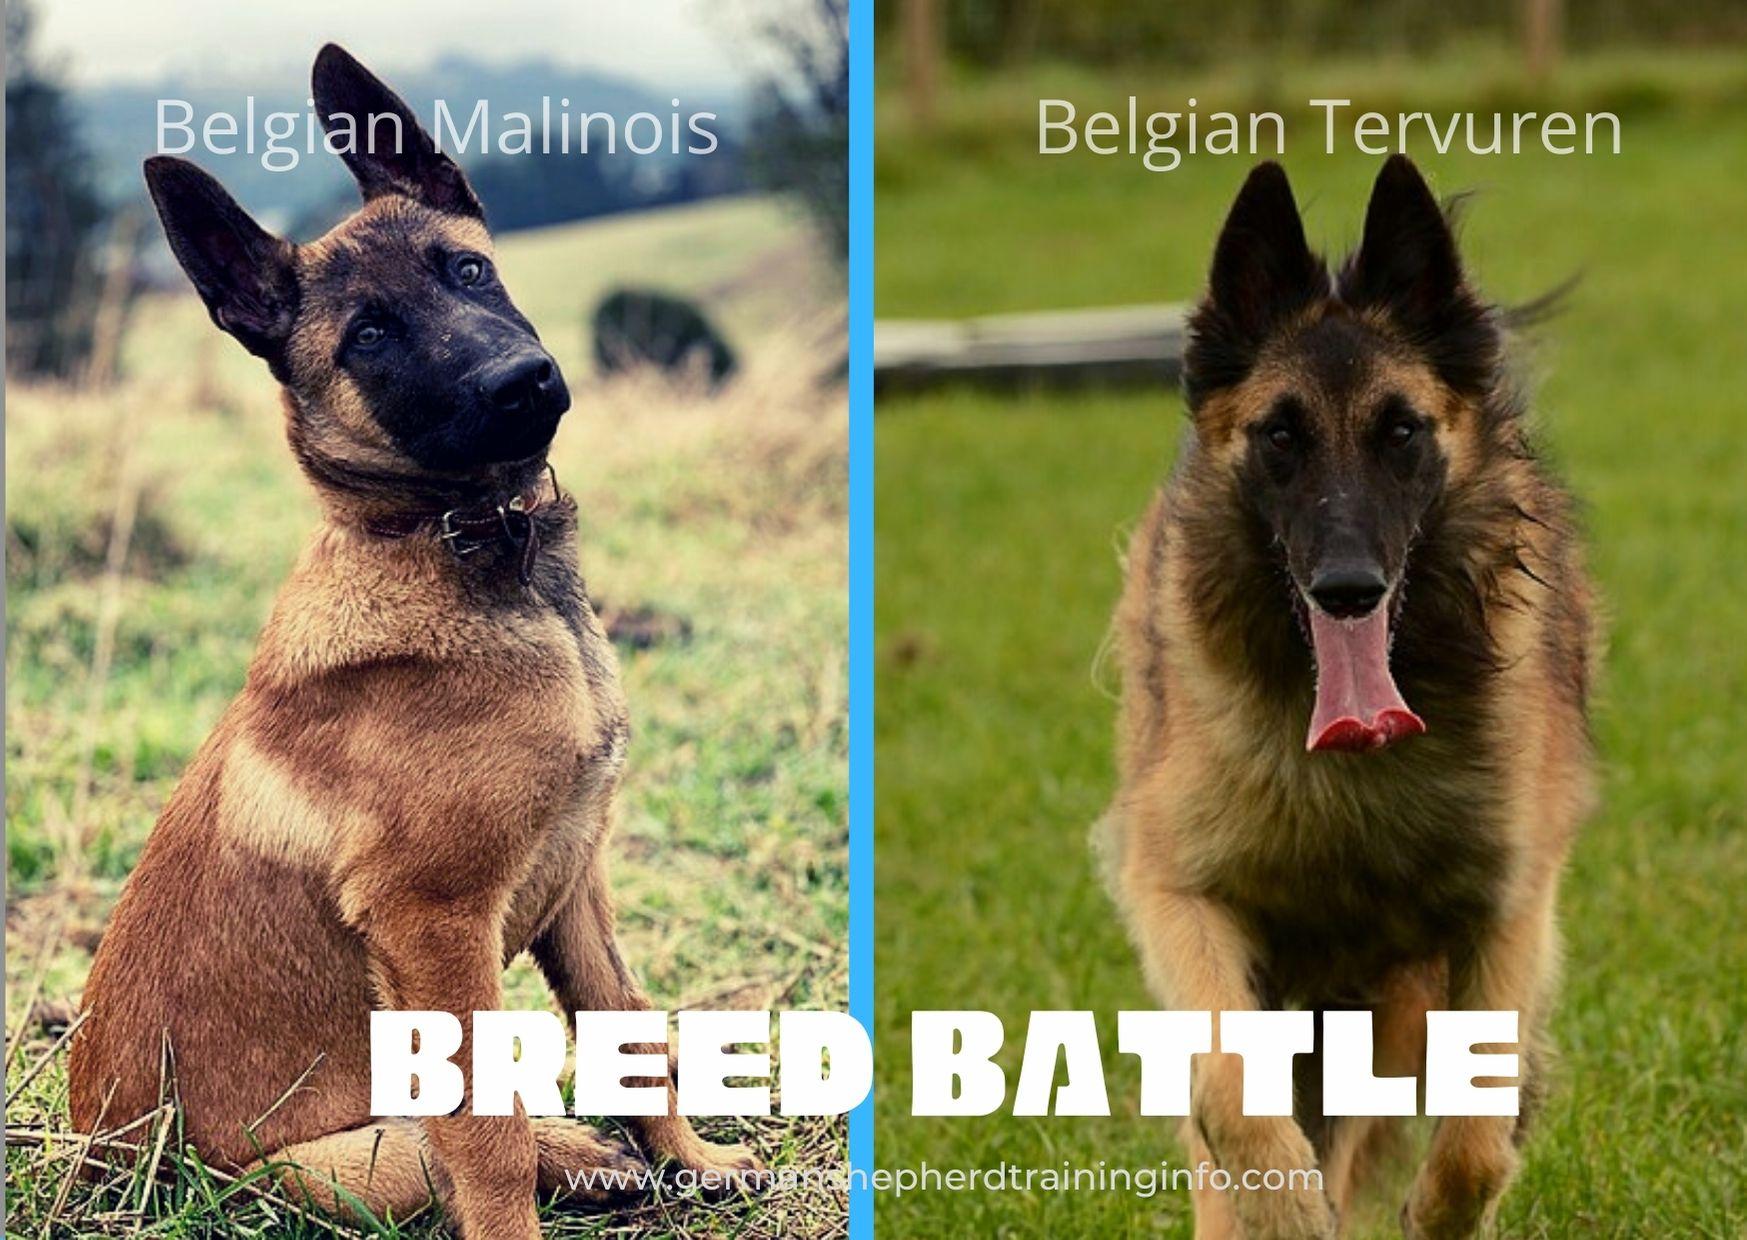 Belgian Malinois vs Belgian Tervuren: Size, Coat, Energy, Health Comparison Guide